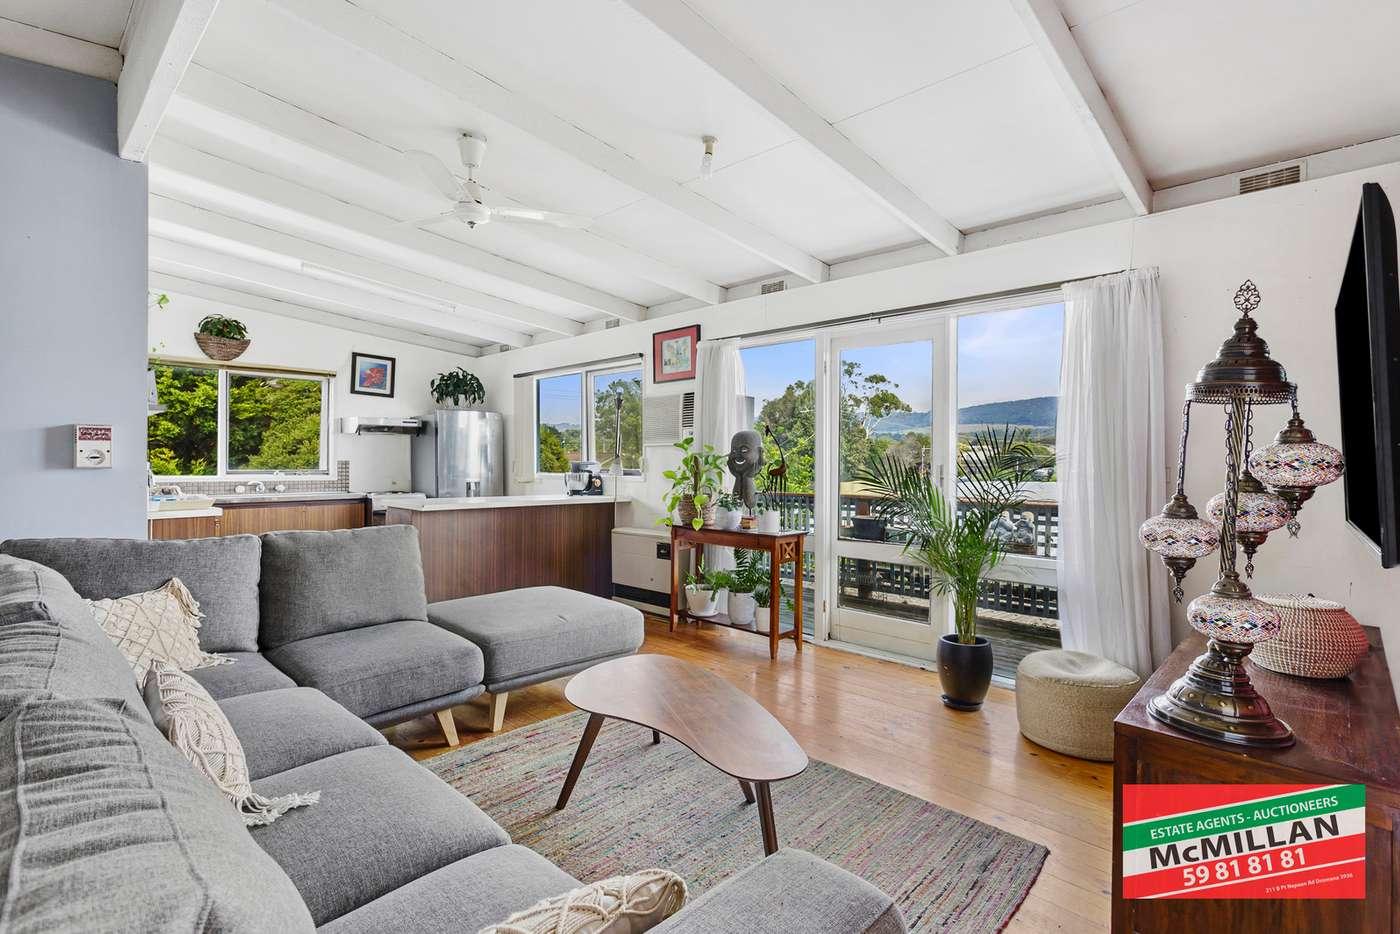 Main view of Homely house listing, 2 Beachurst Avenue, Dromana VIC 3936